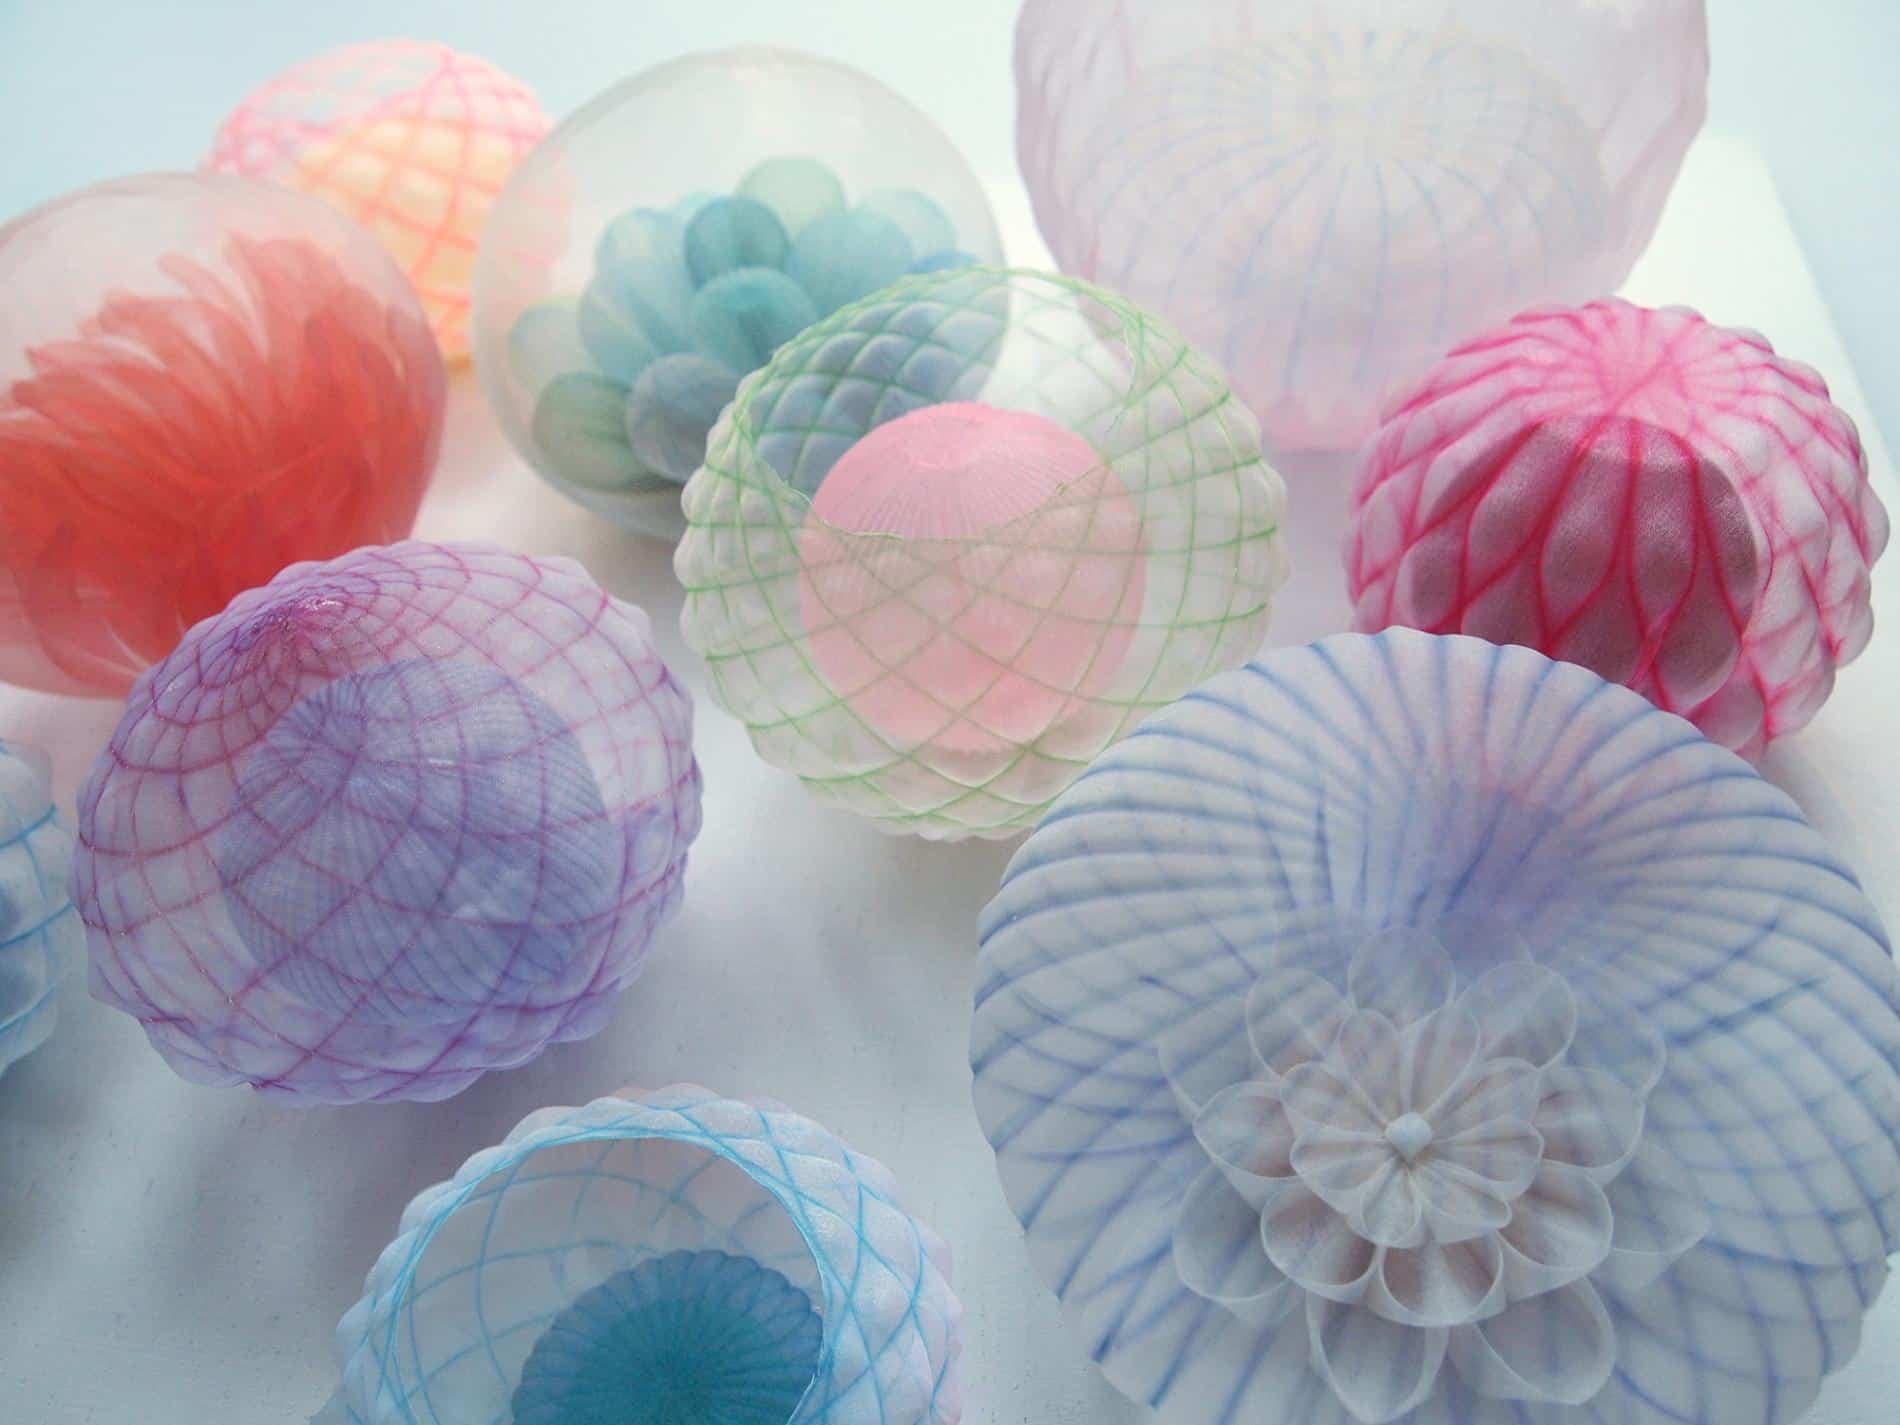 kusumoto textiles traslucidos d